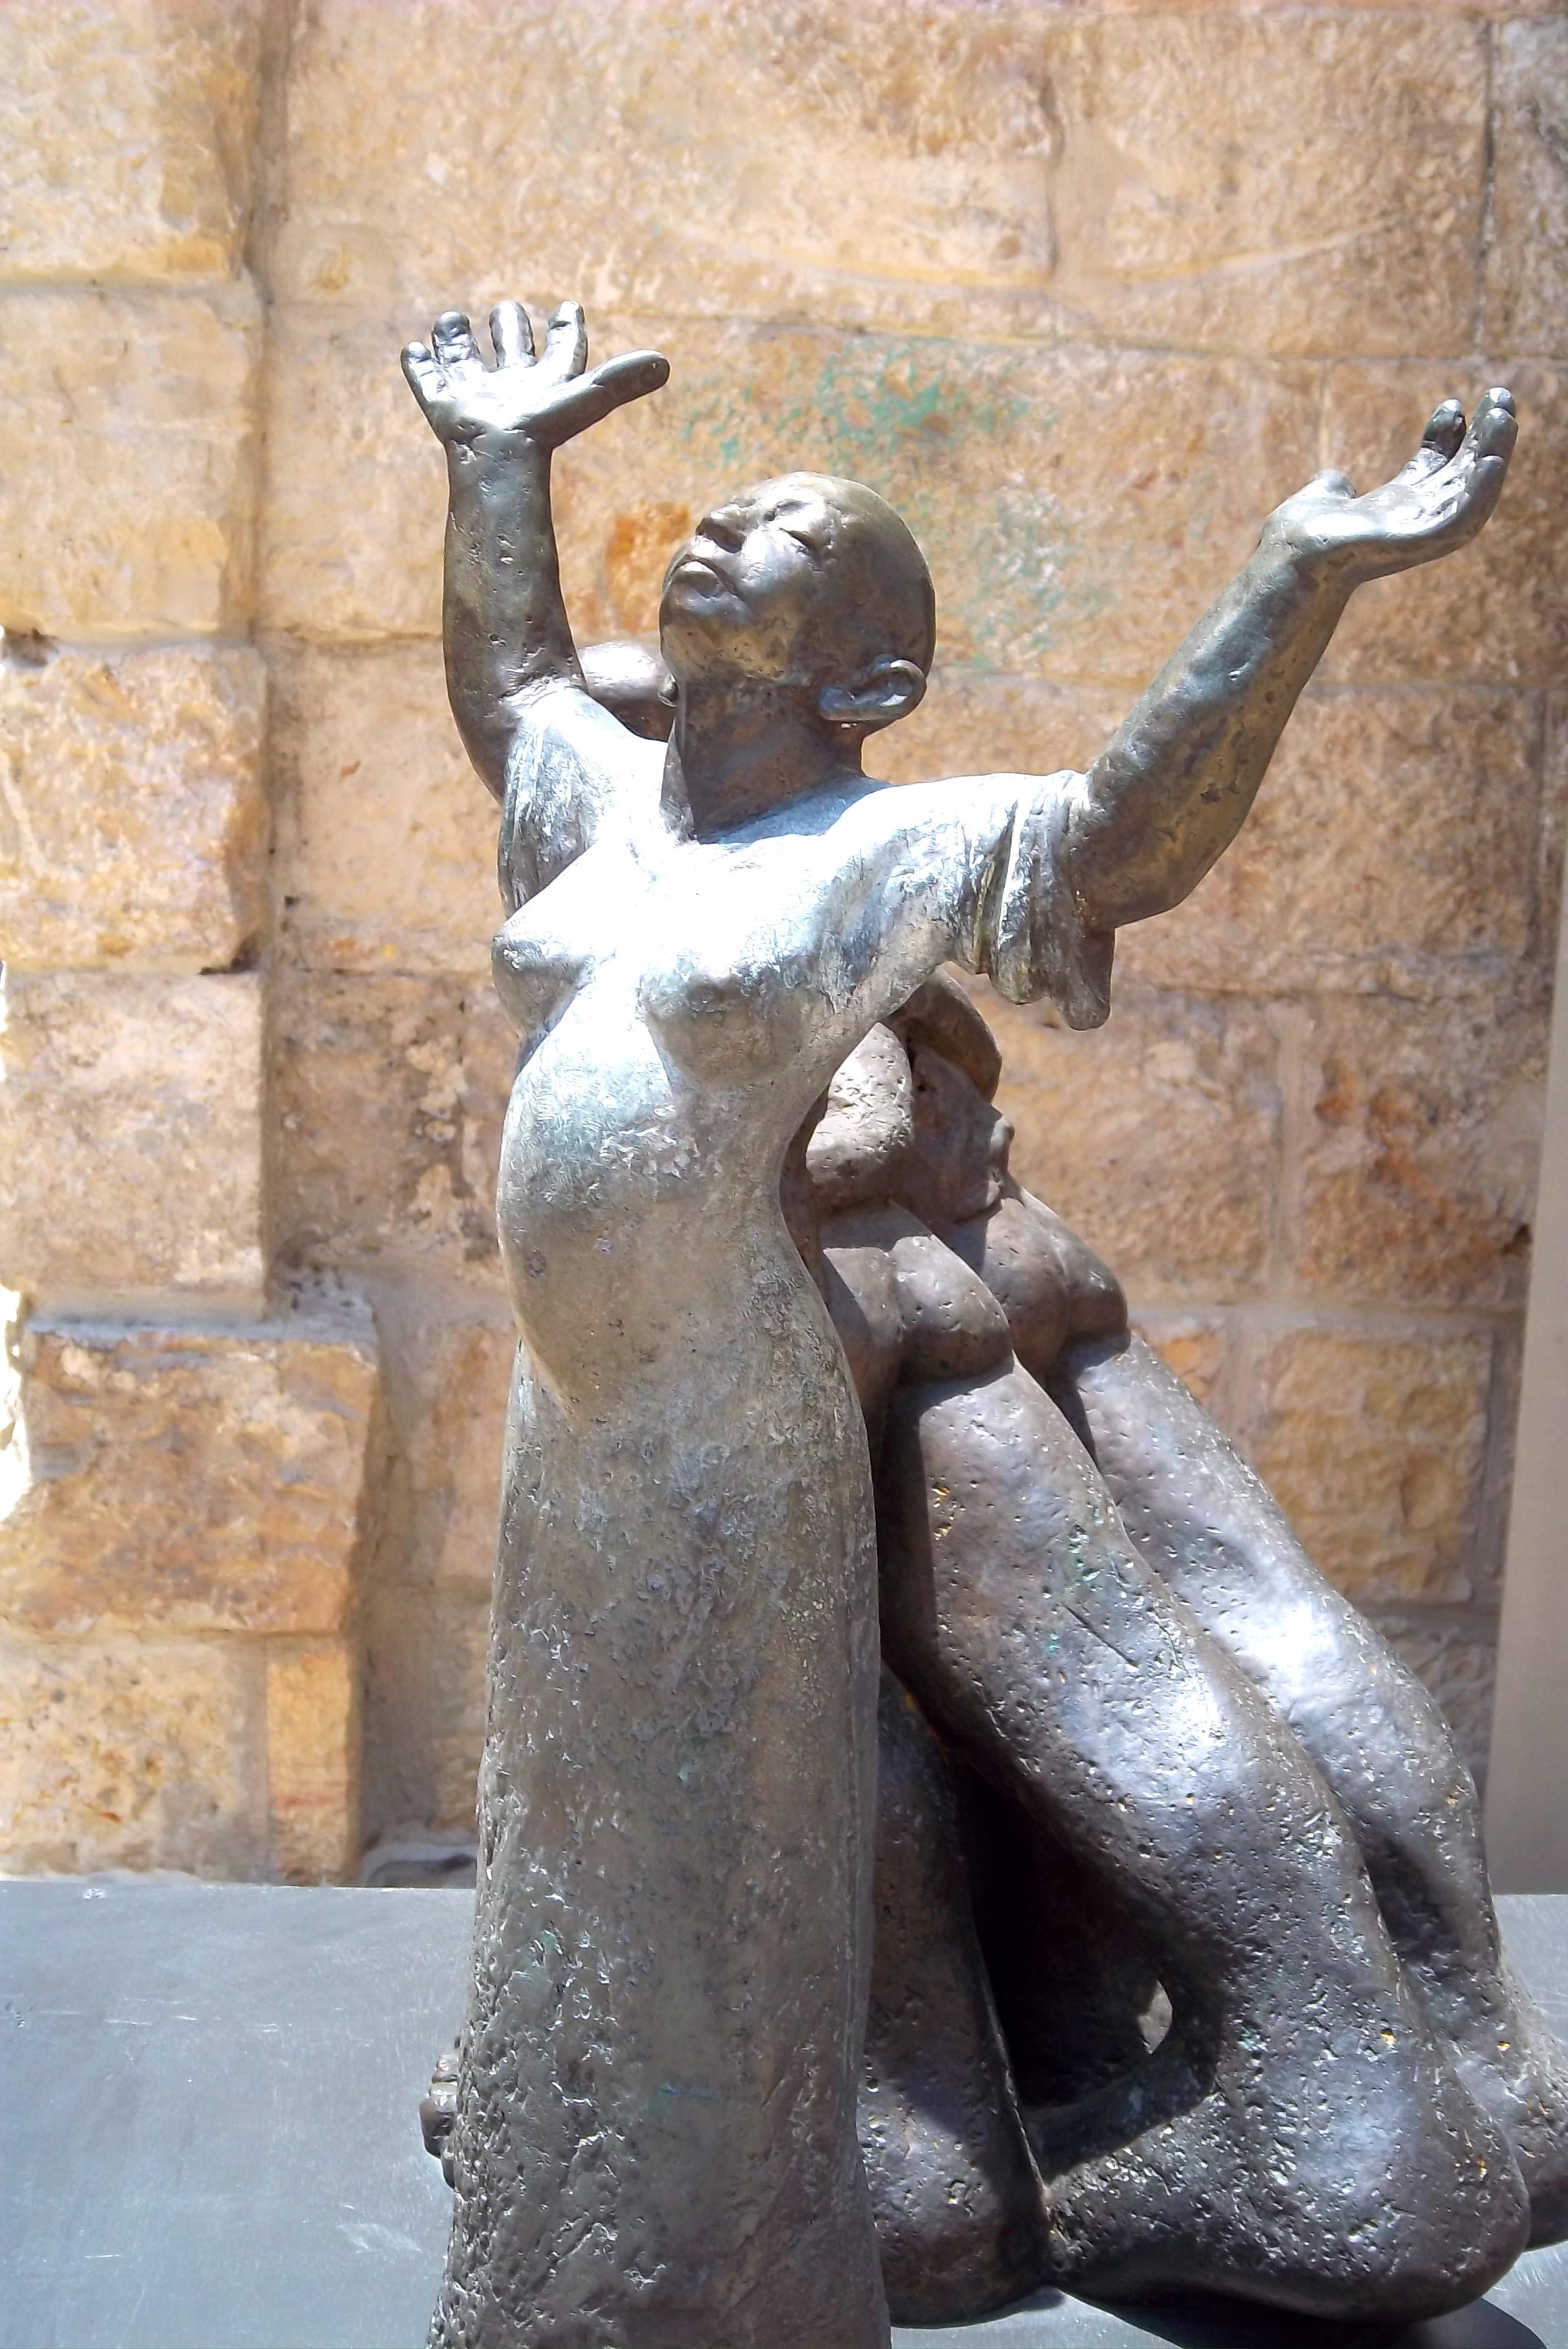 Hannah, a sculpture al Mamilla Mall, Jerusalem